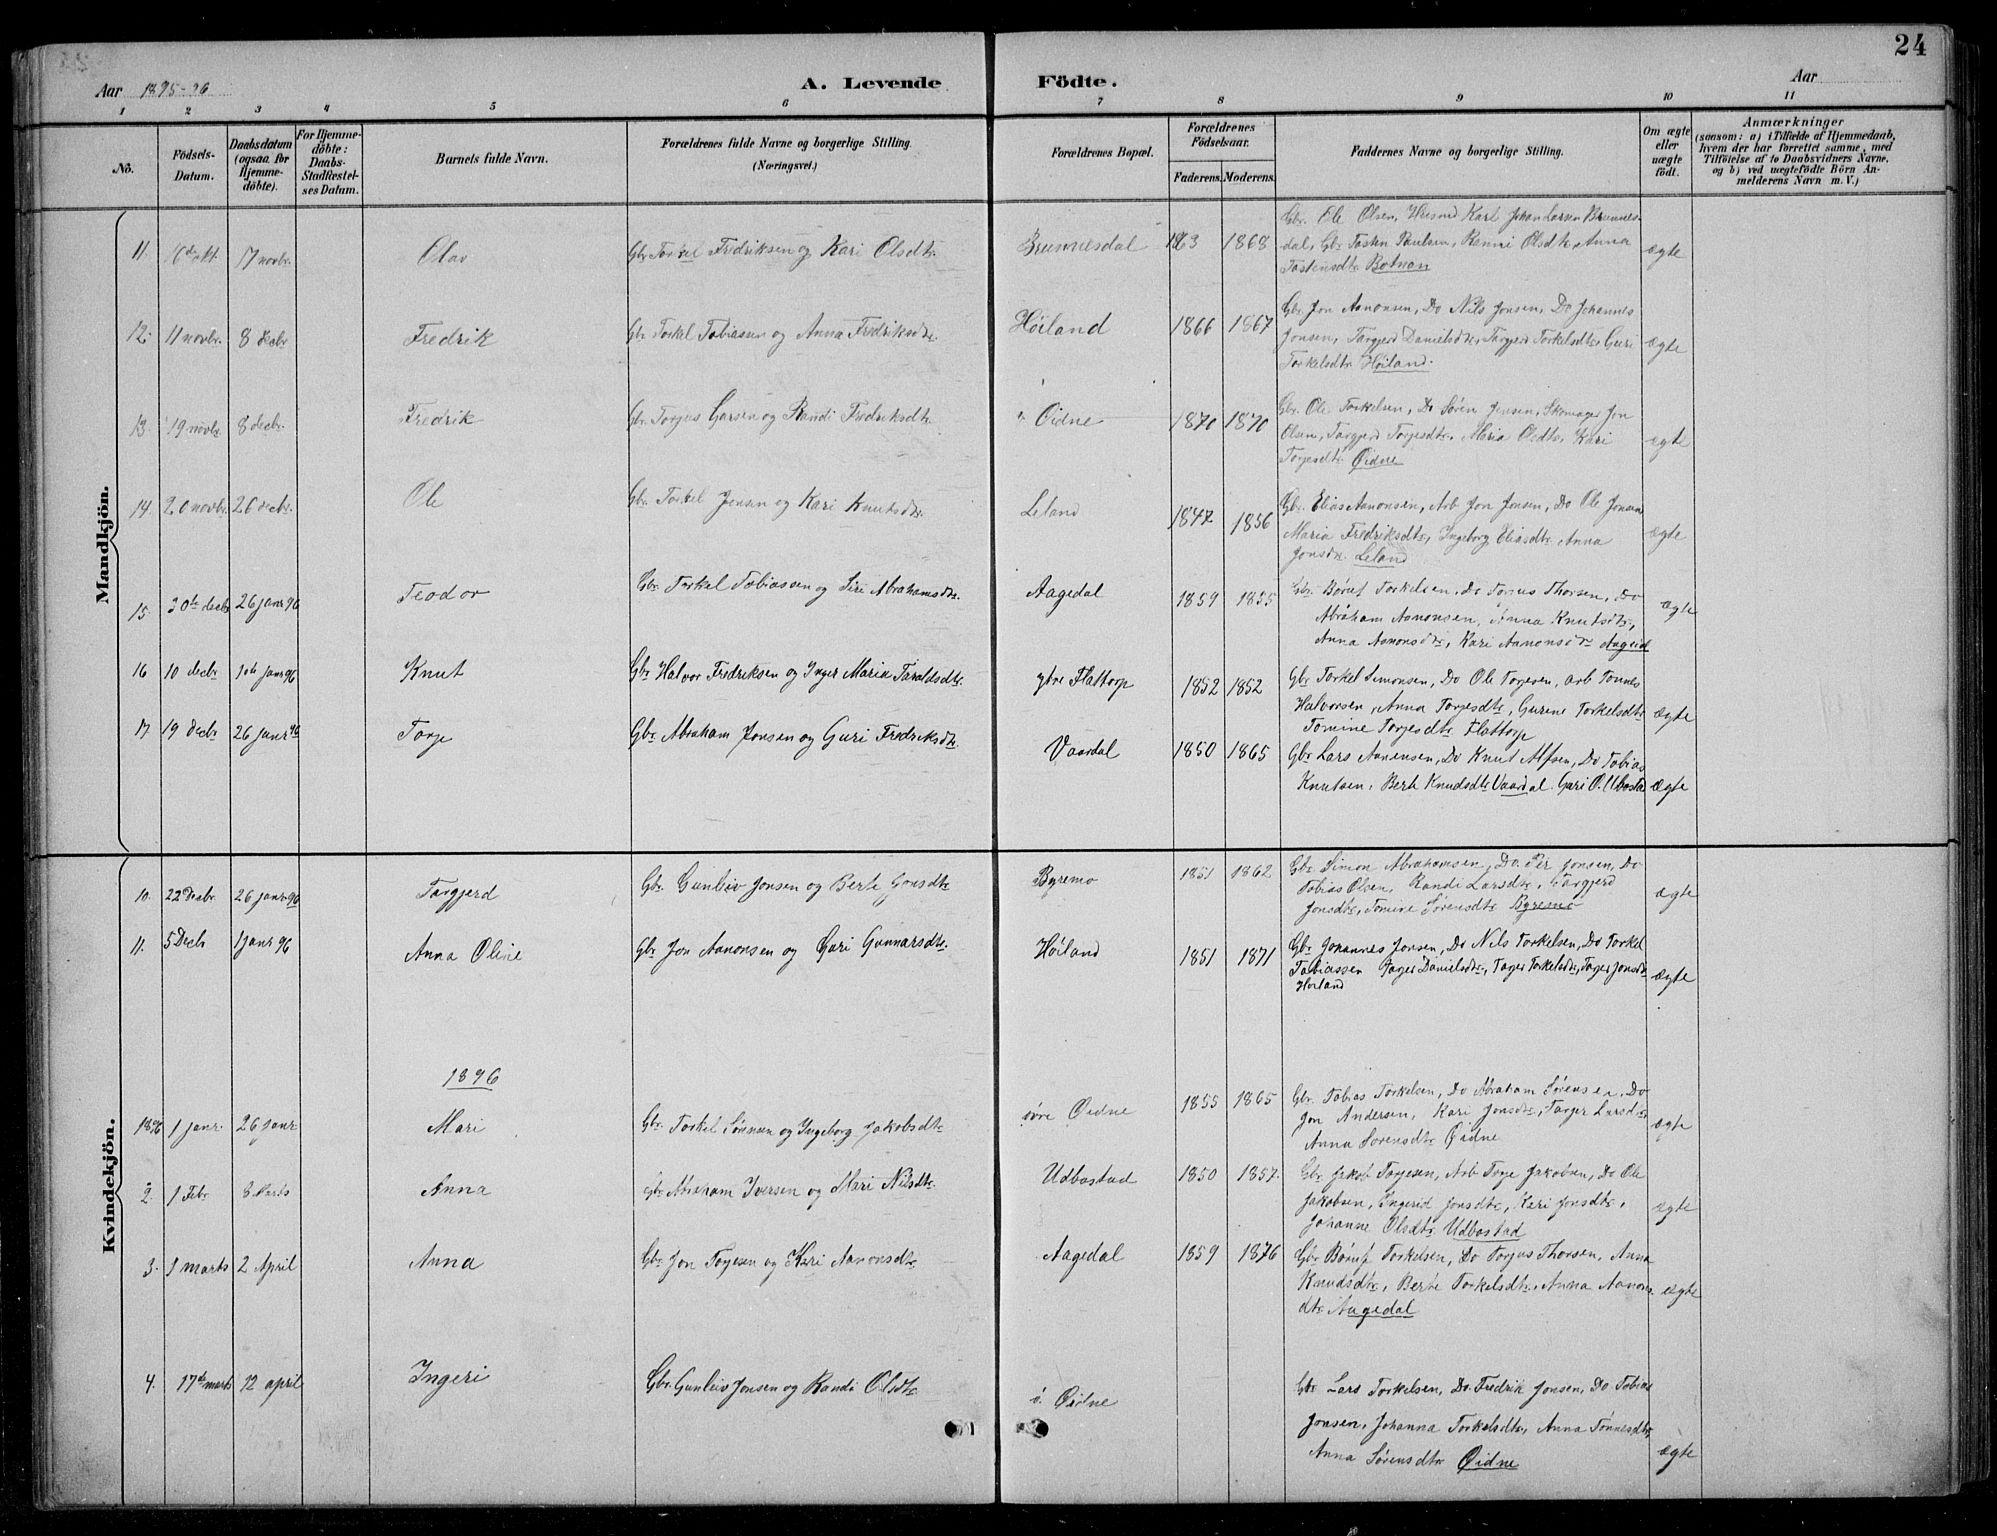 SAK, Bjelland sokneprestkontor, F/Fb/Fbc/L0003: Klokkerbok nr. B 3, 1887-1924, s. 24